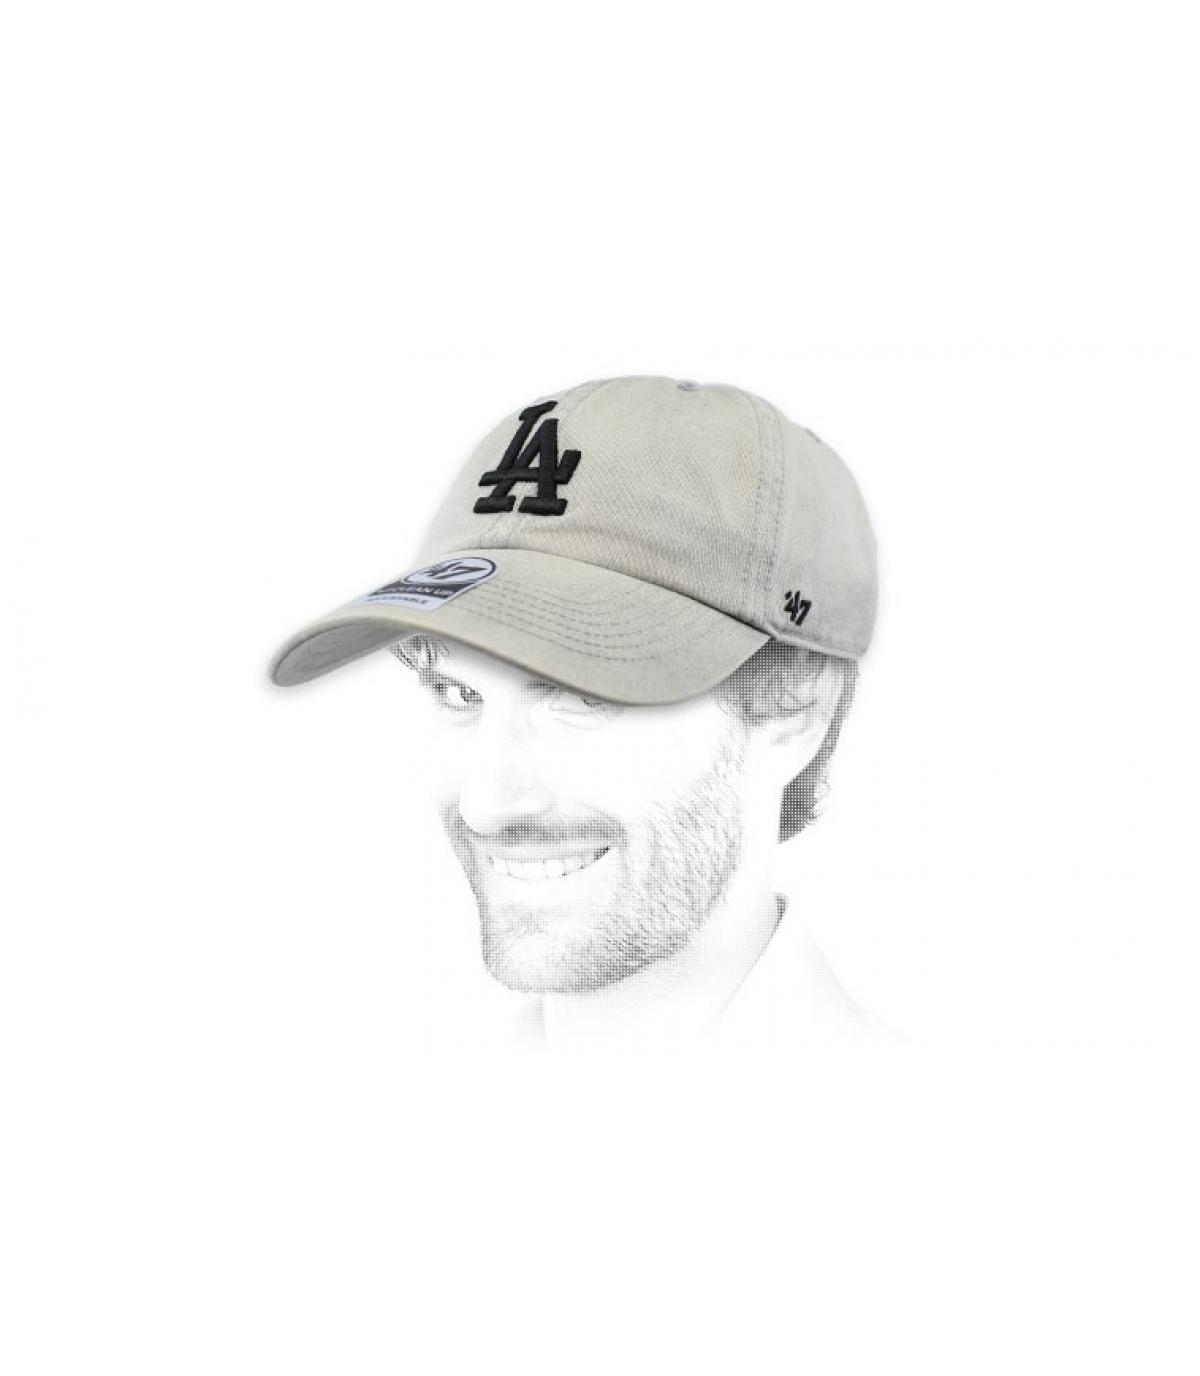 gorra LA gris claro